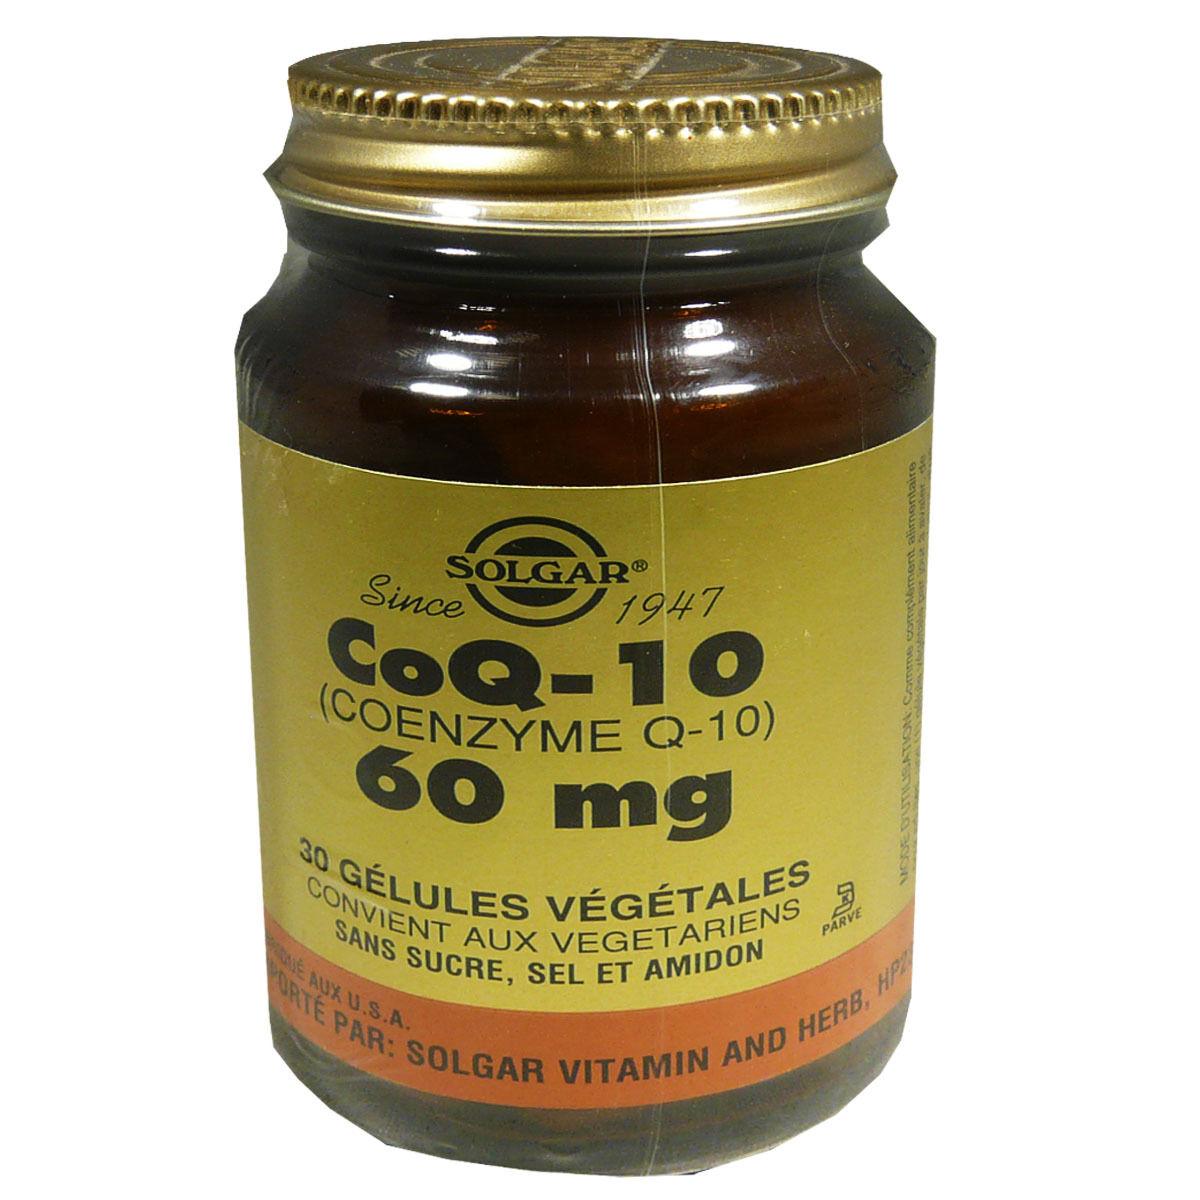 Solgar coq-10 60 mg 30 gelules